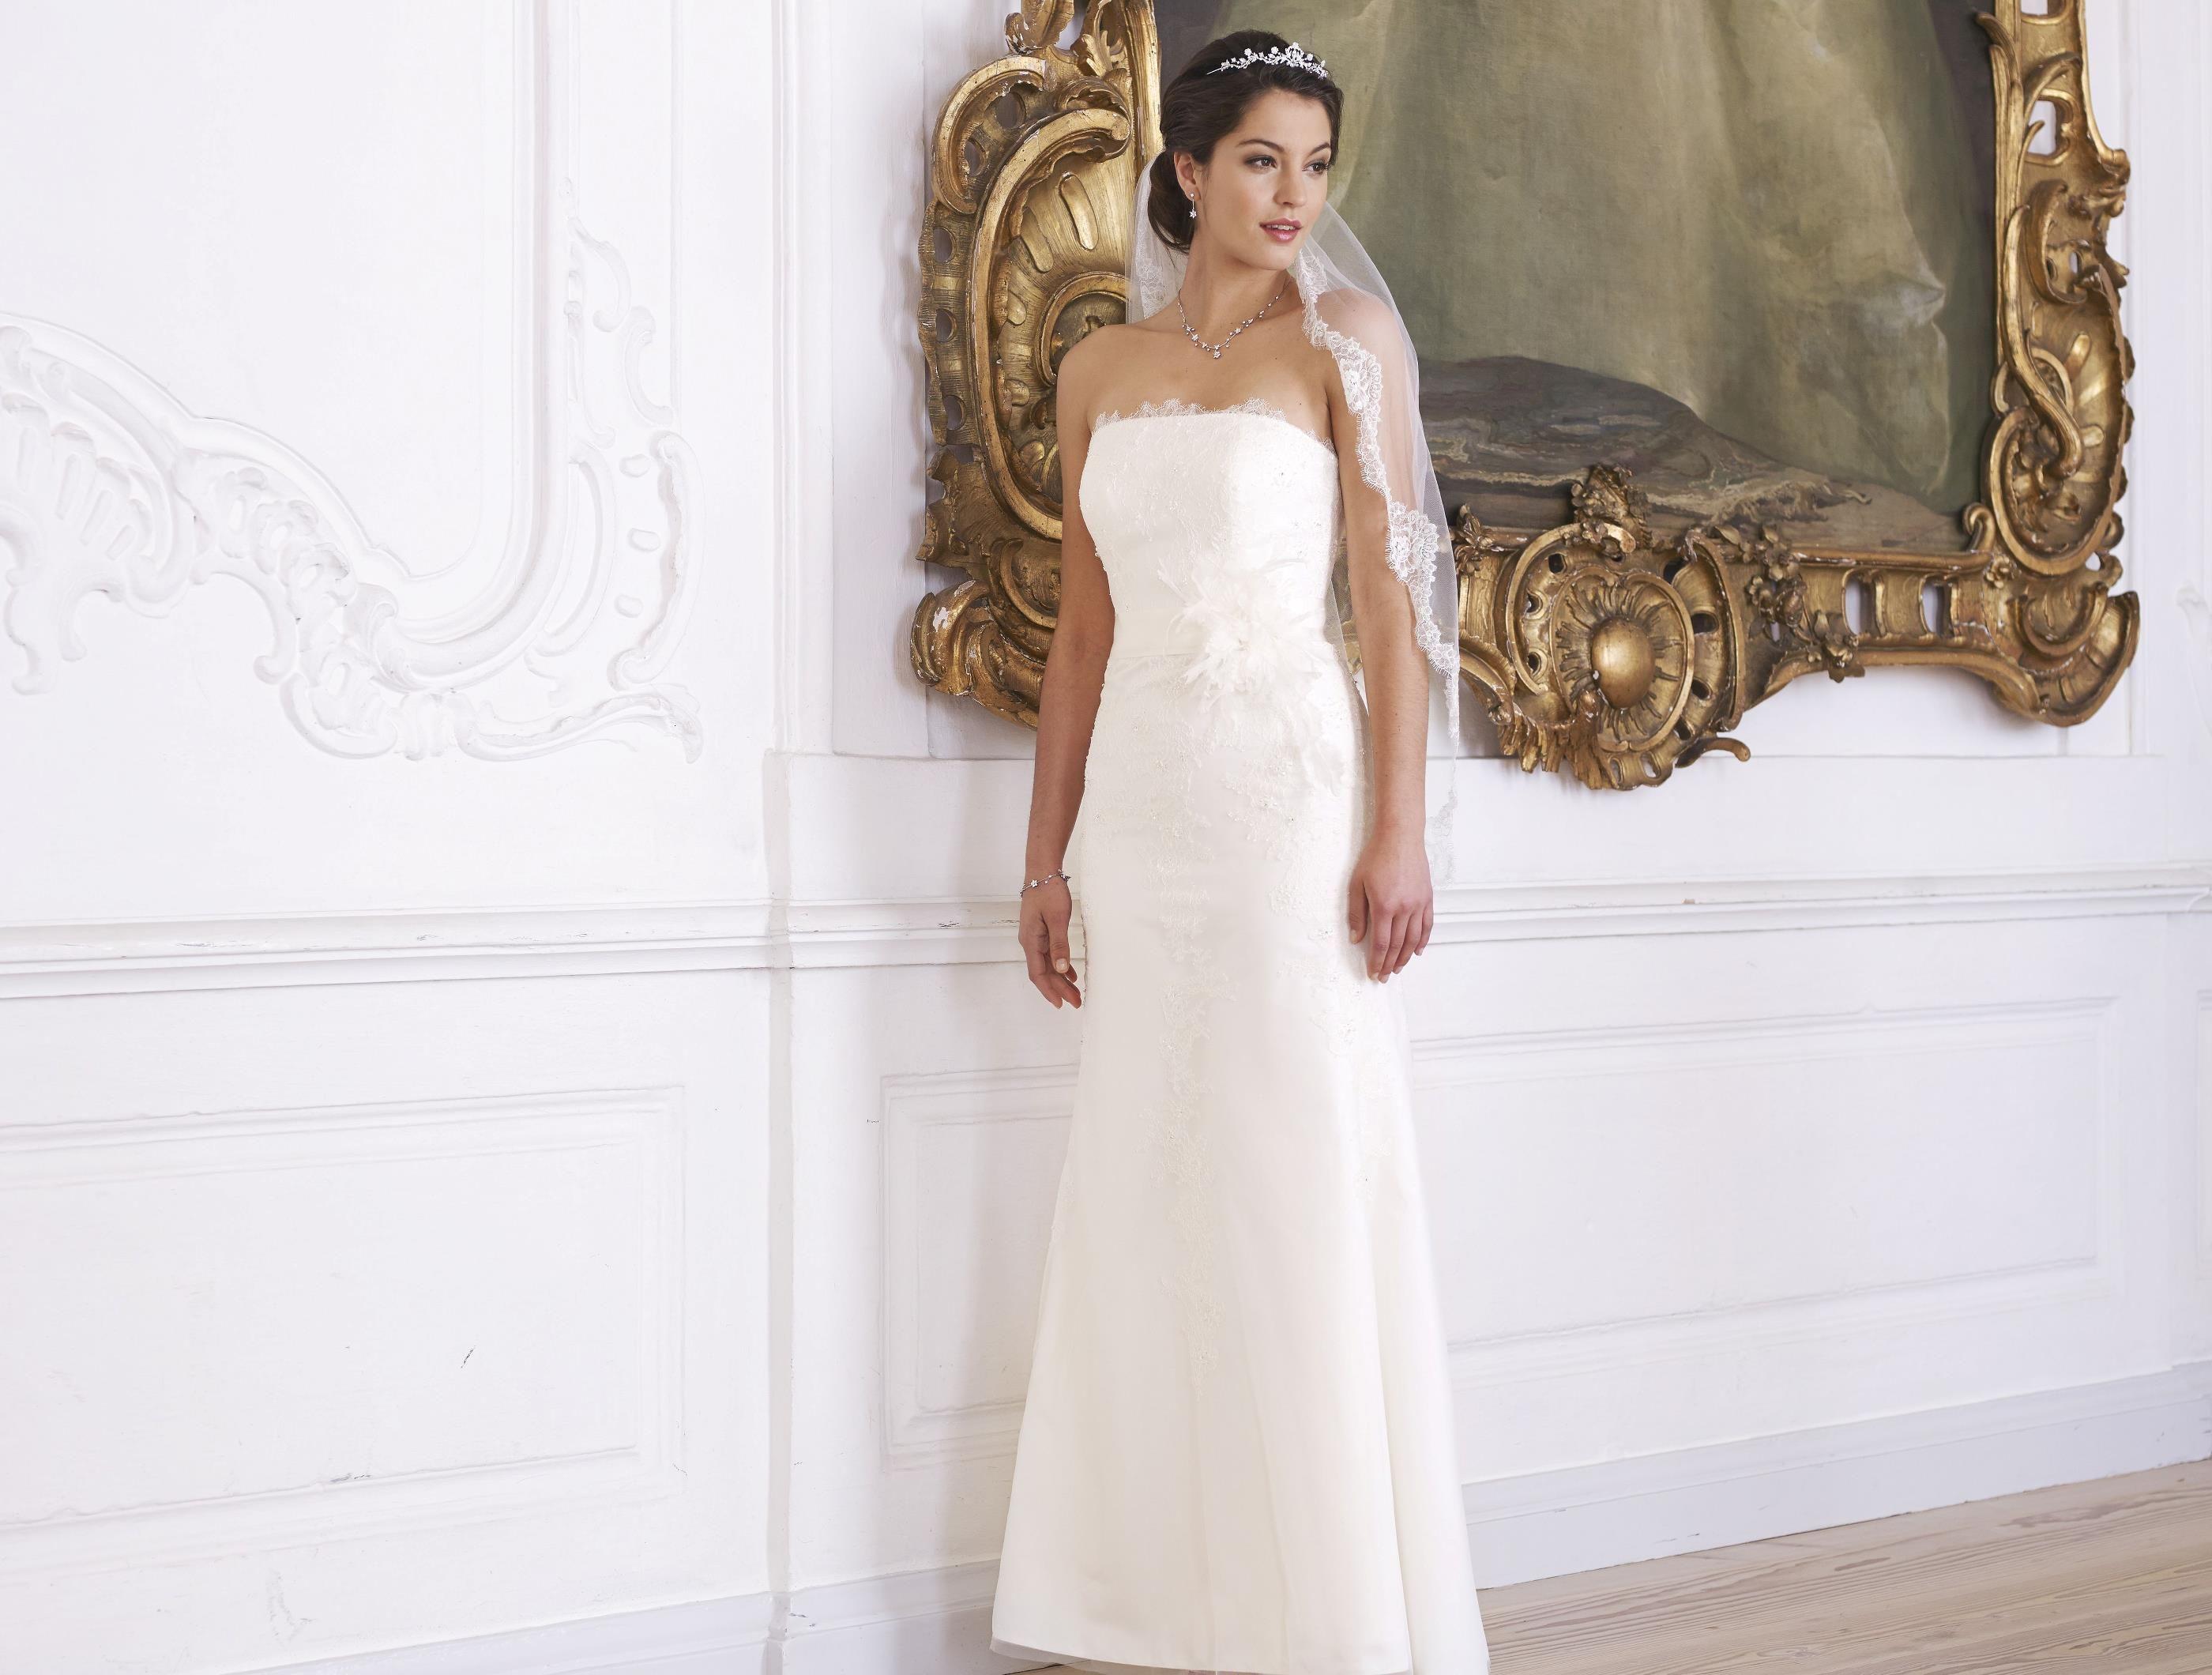 Brautkleid | Kleider <3 | Pinterest | Wedding and Weddings